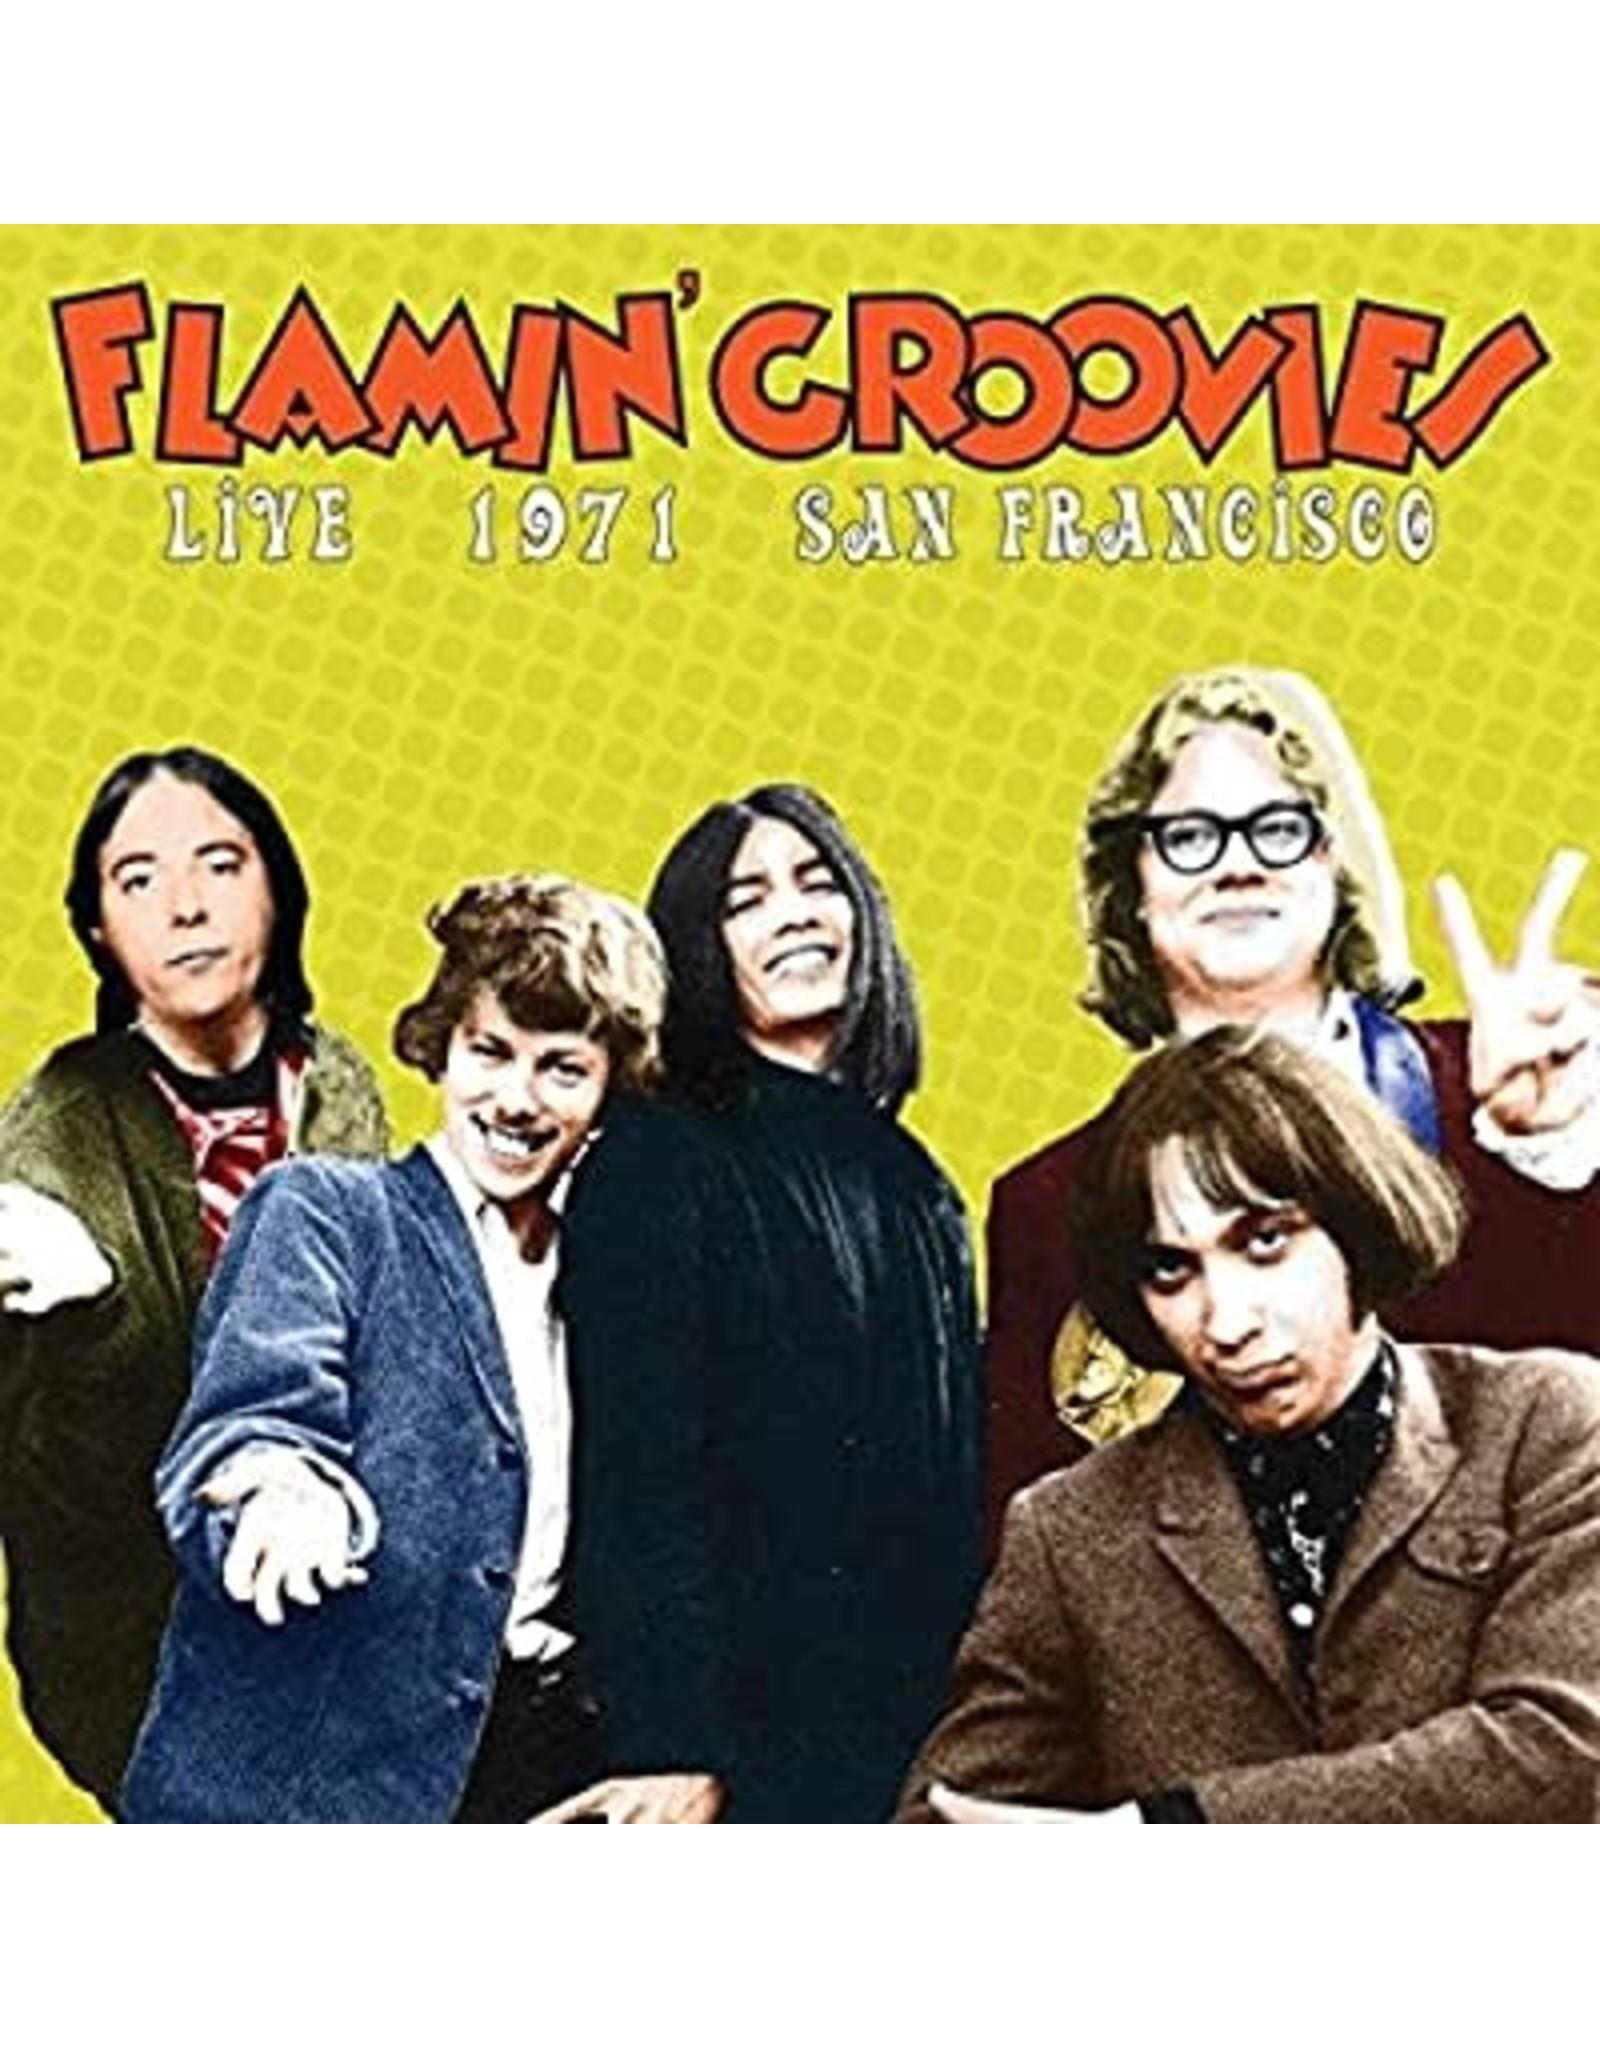 New Vinyl Flamin' Groovies - Live 1971 San Francisco LP